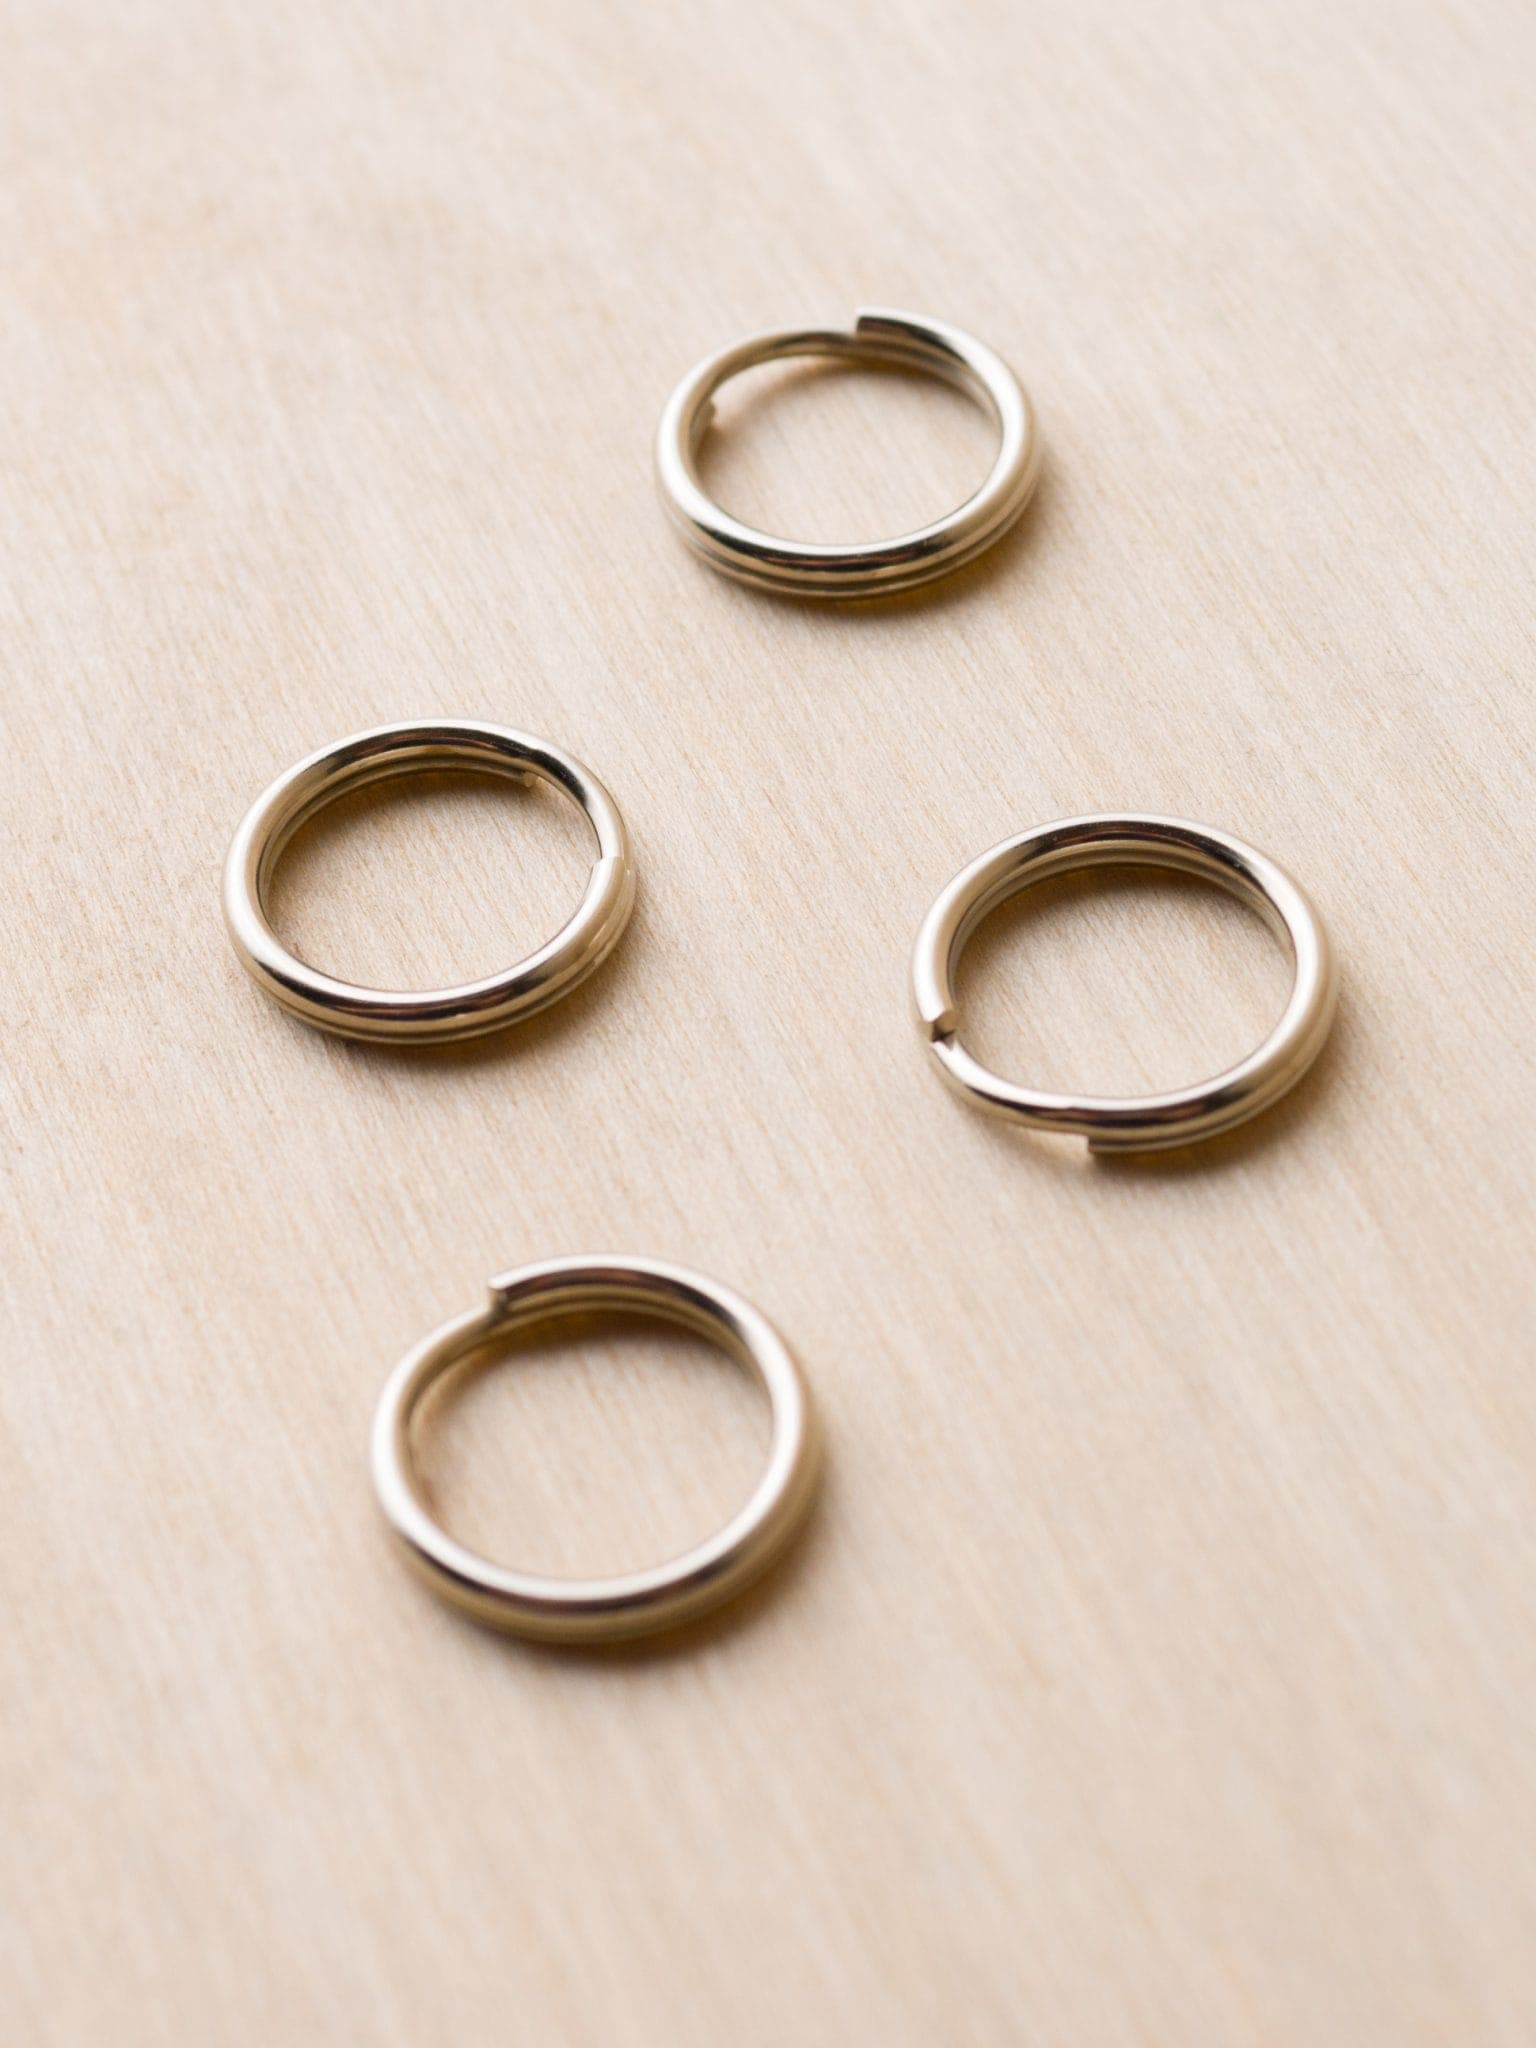 round split rings for camera strap attachment